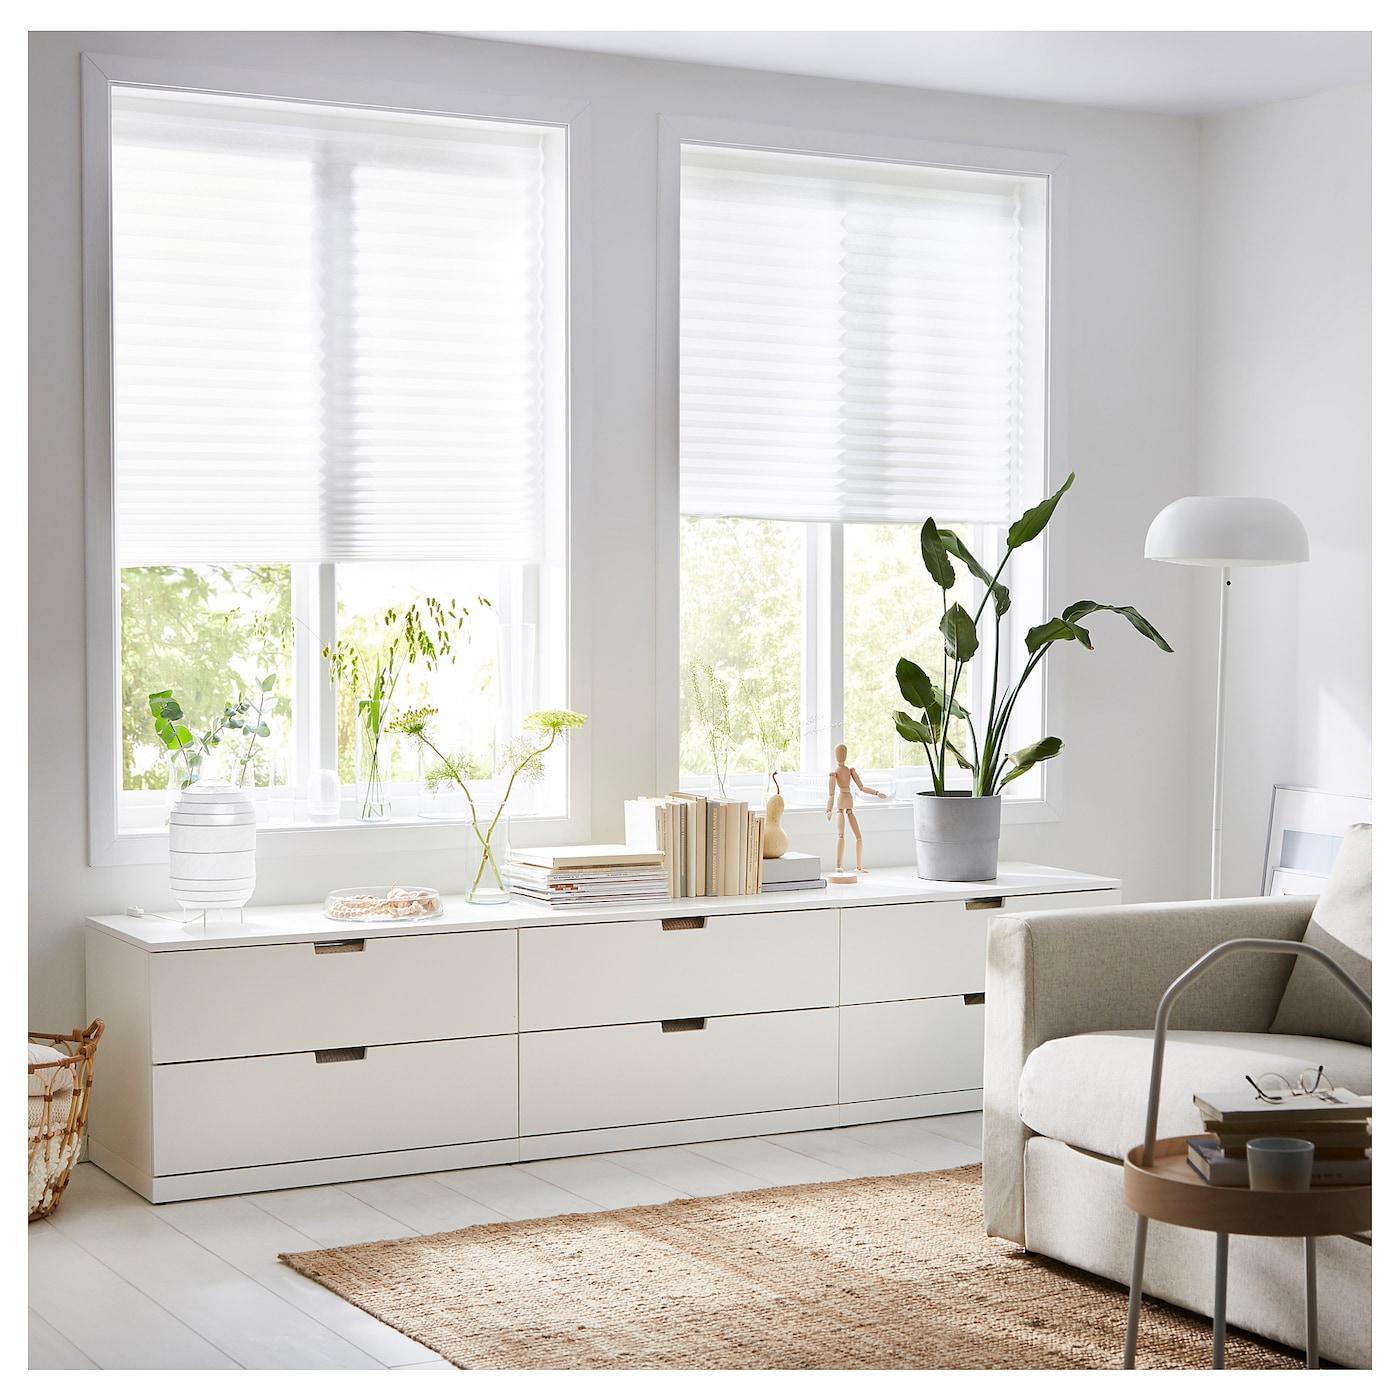 SCHOTTIS Plisségordijn Wit 90 x 190 cm - IKEA